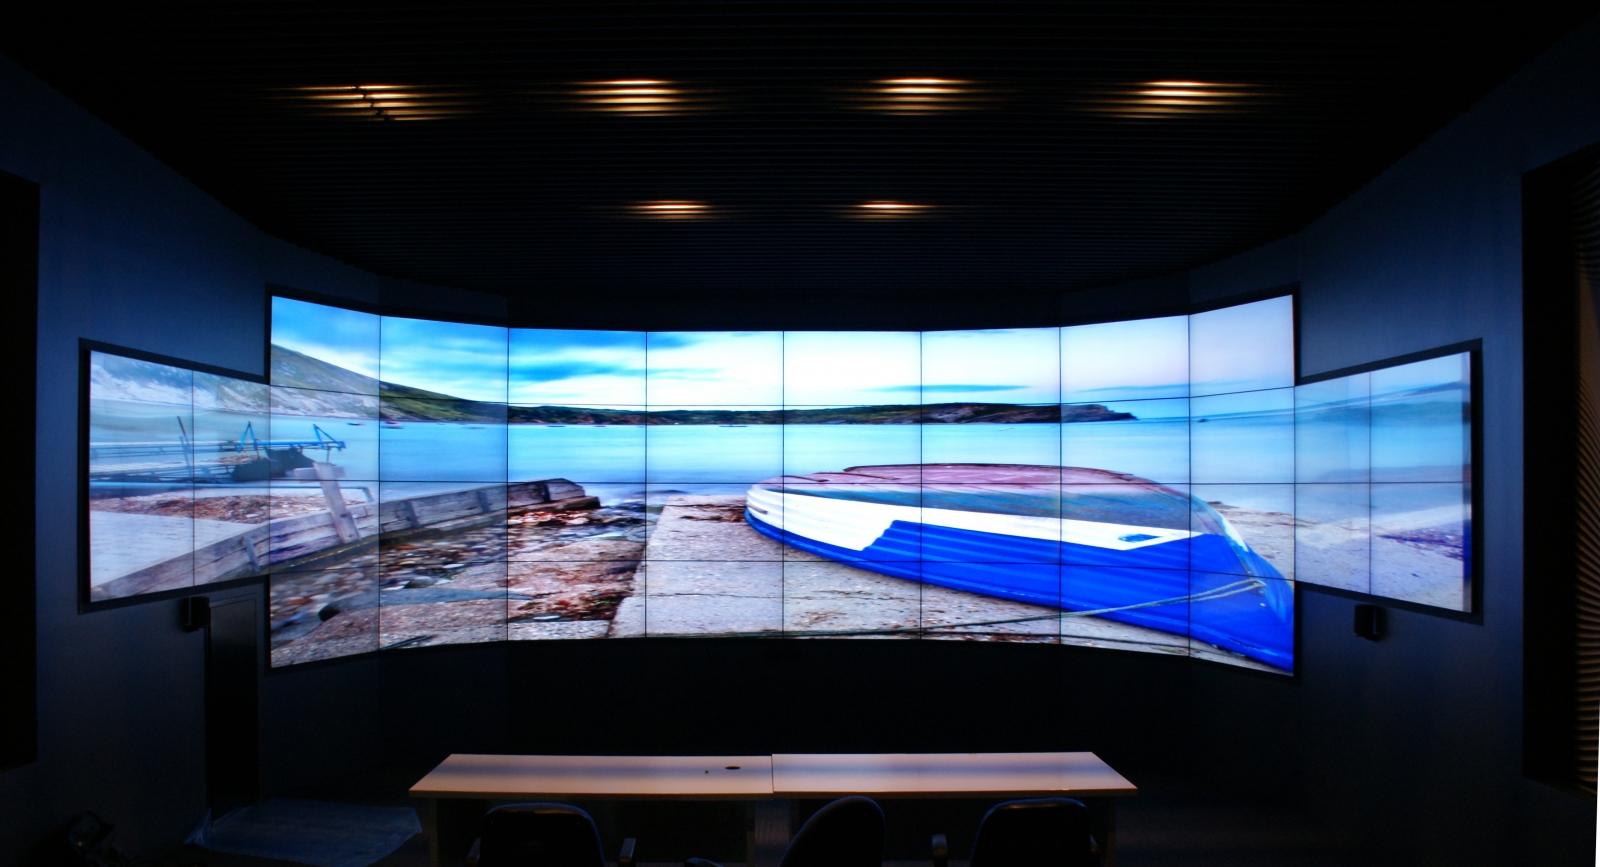 Corporate Presentation Room Provides Versatile Information